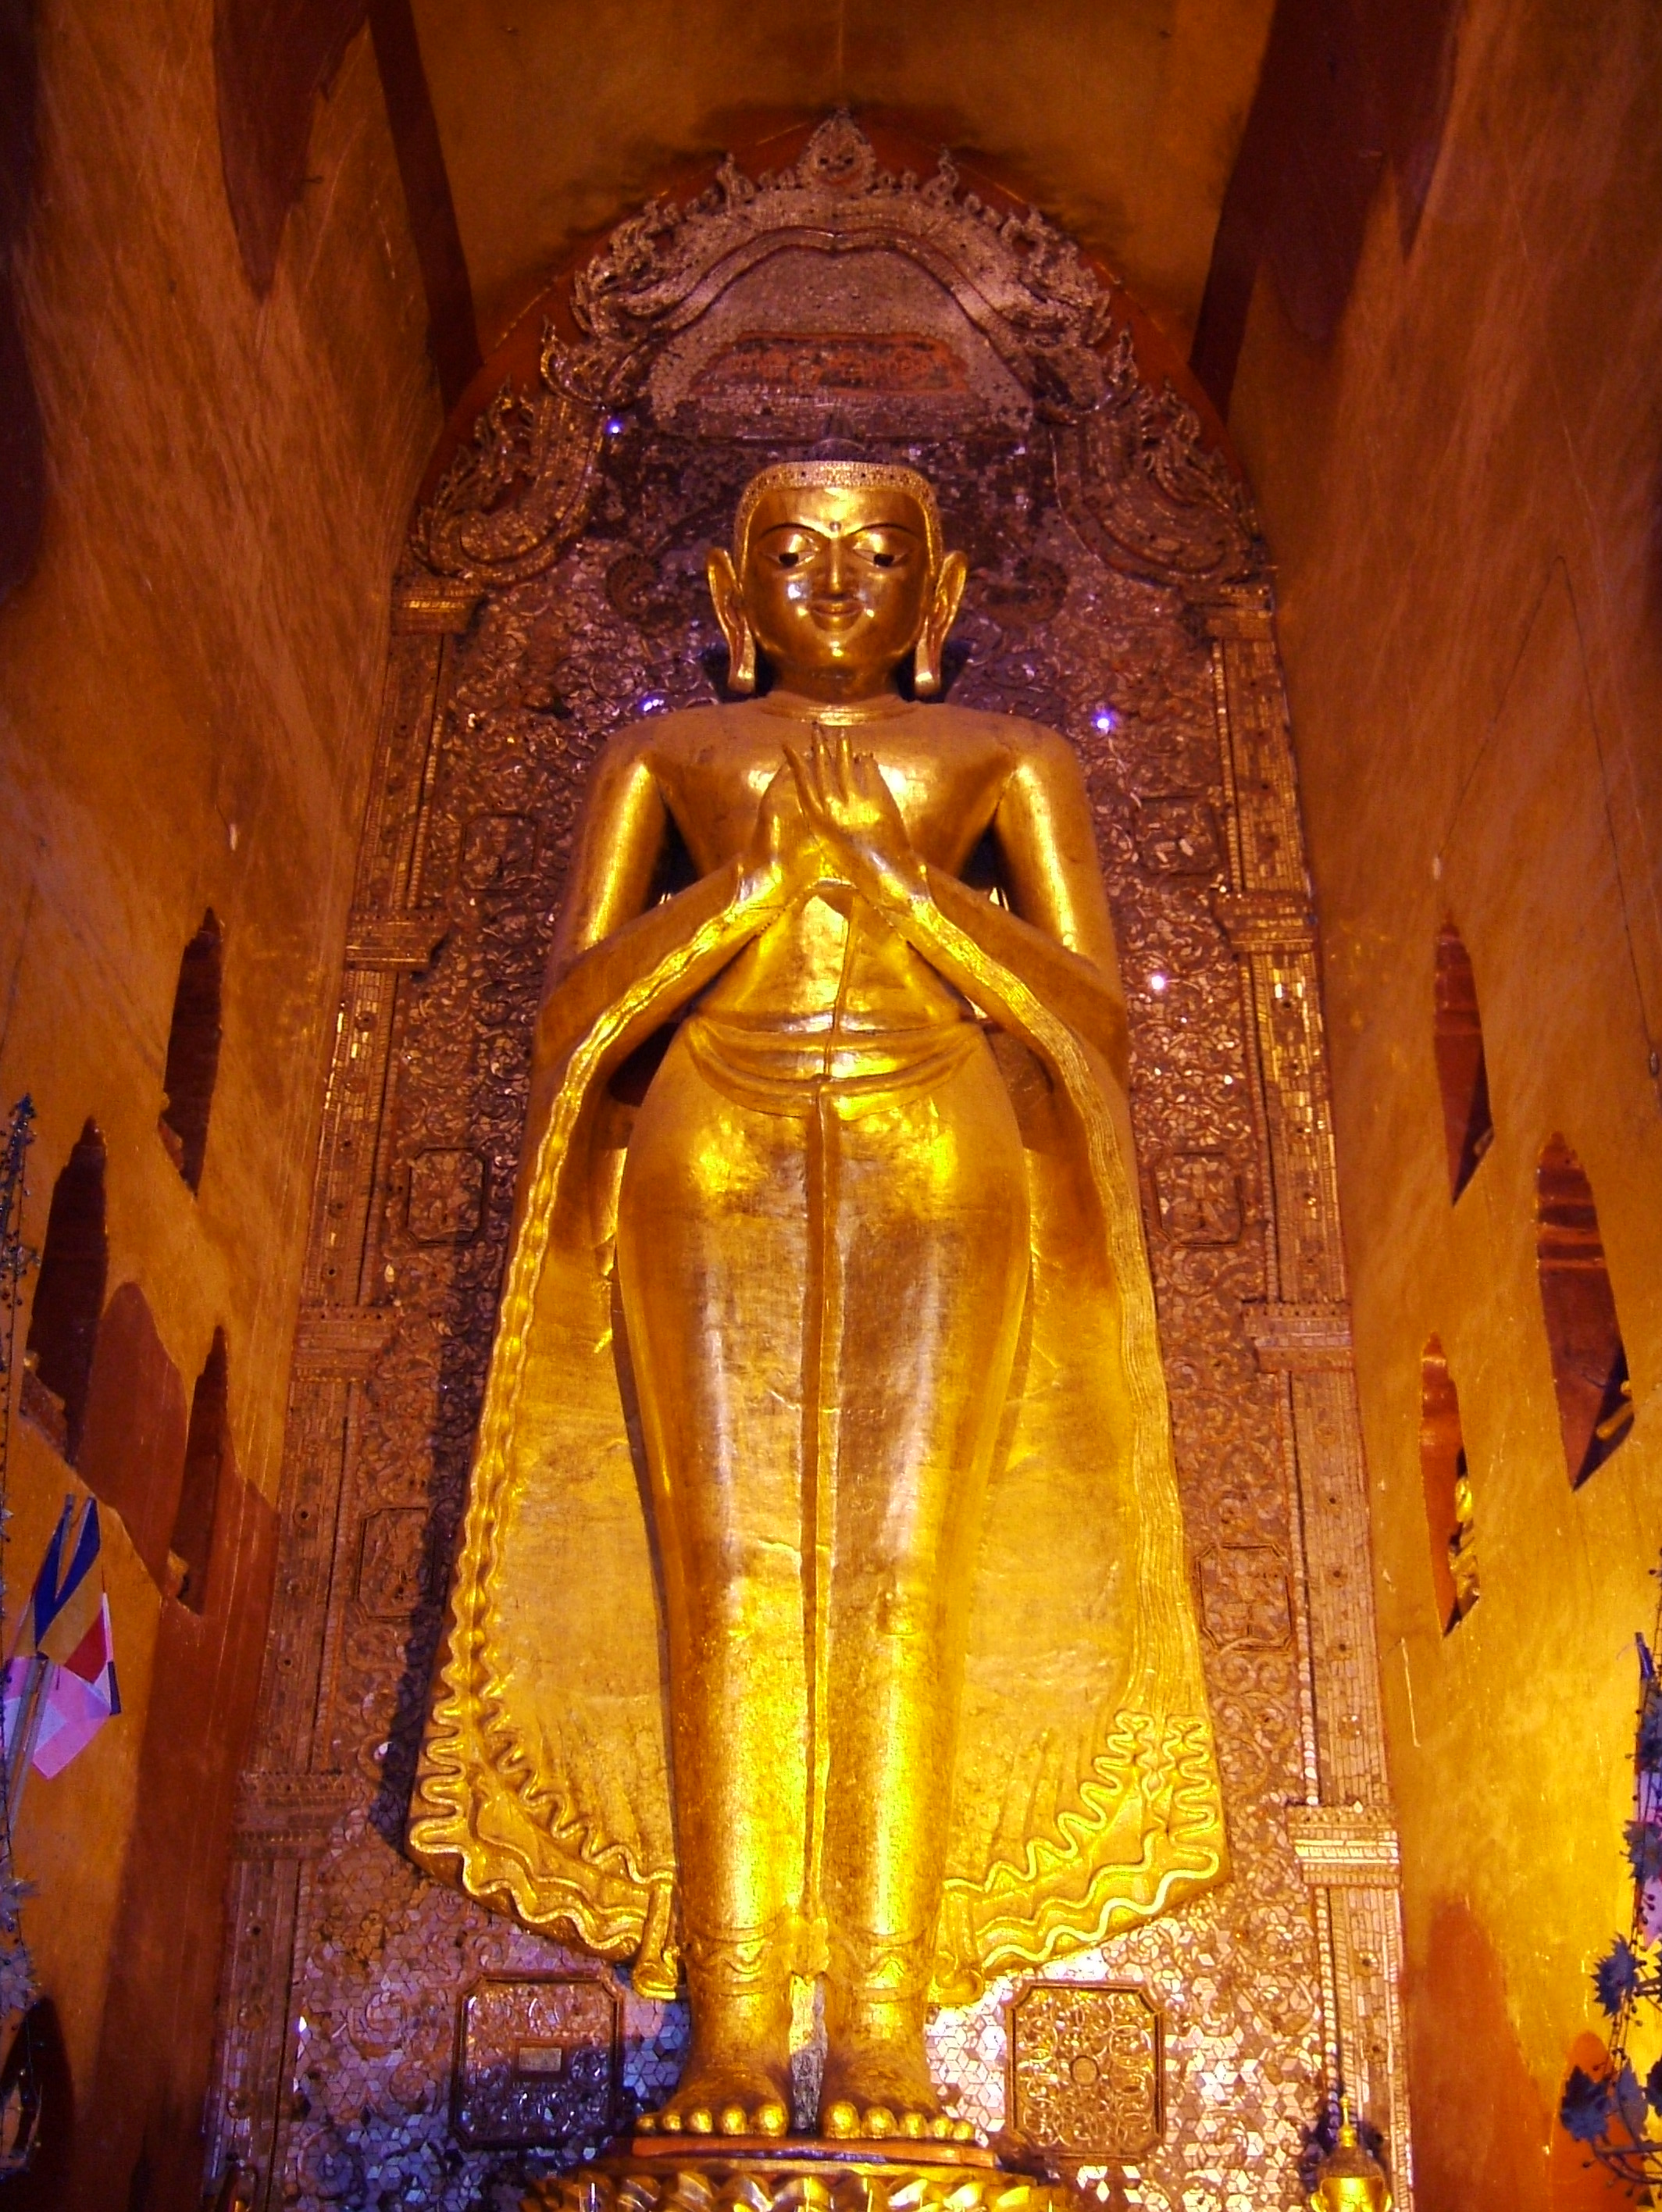 Ananda Pagoda standing Buddhas Pagan Dec 2000 12